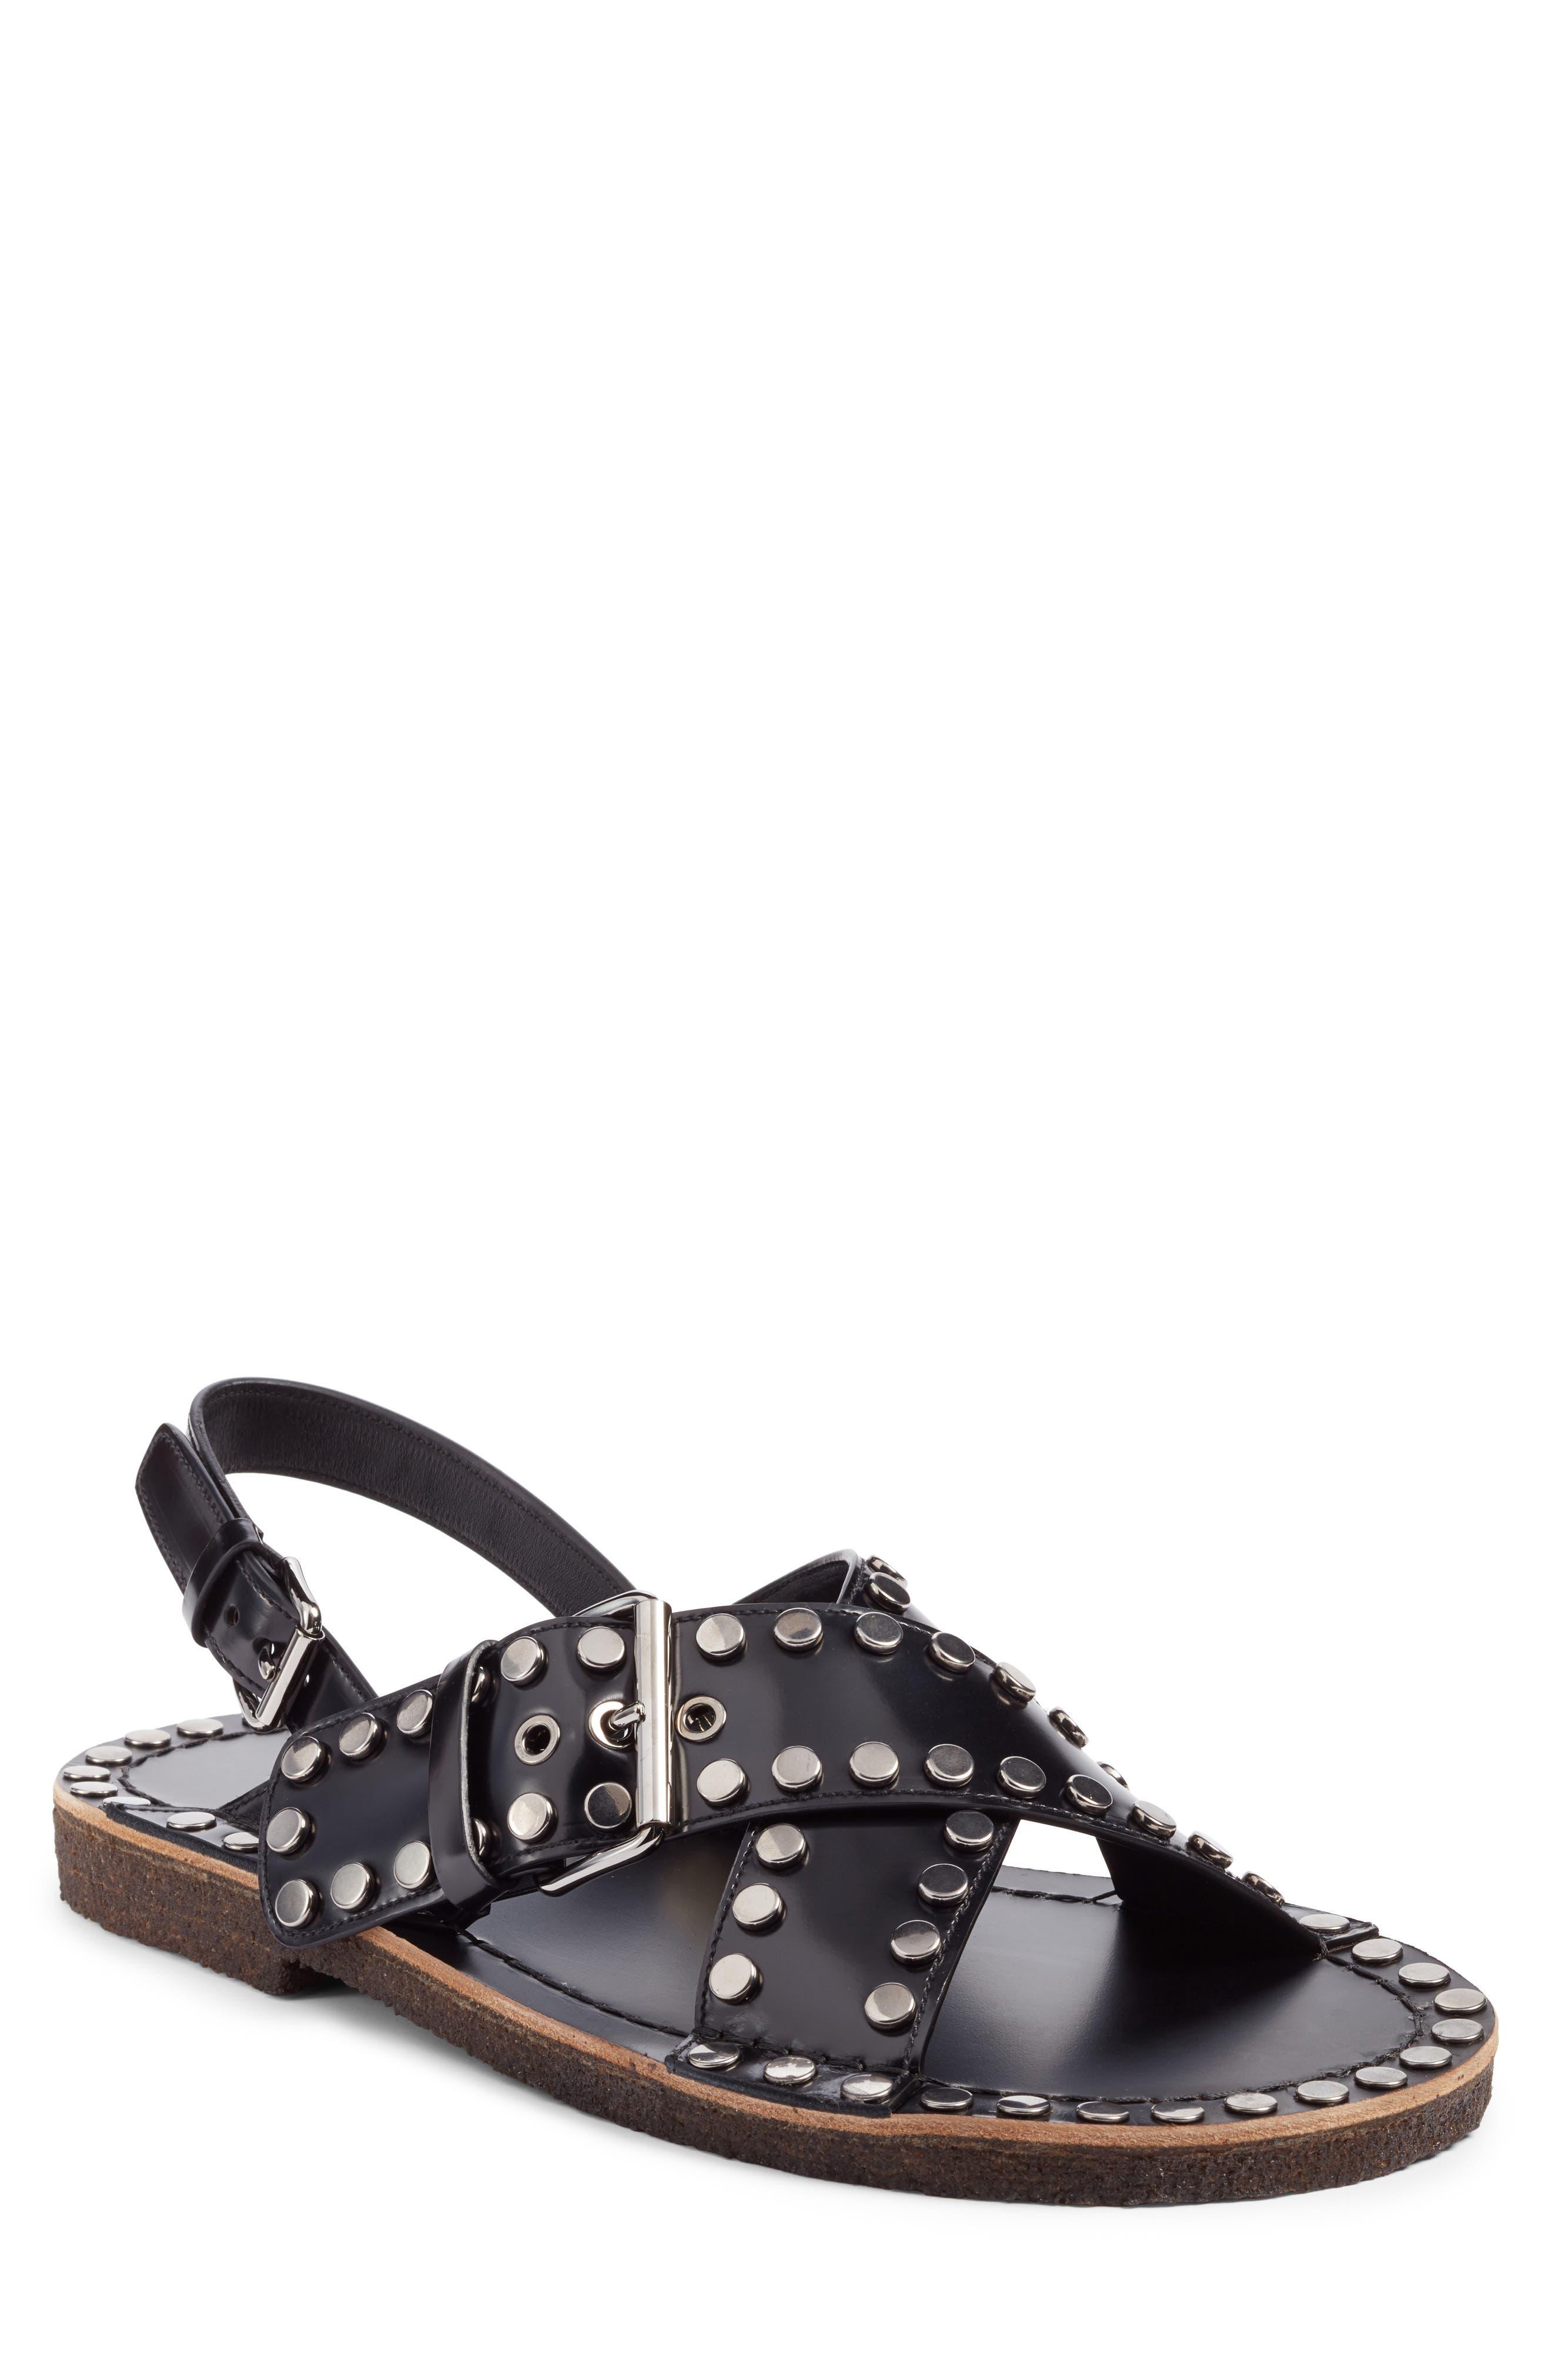 Crisscross Sandal,                         Main,                         color, Nero Leather